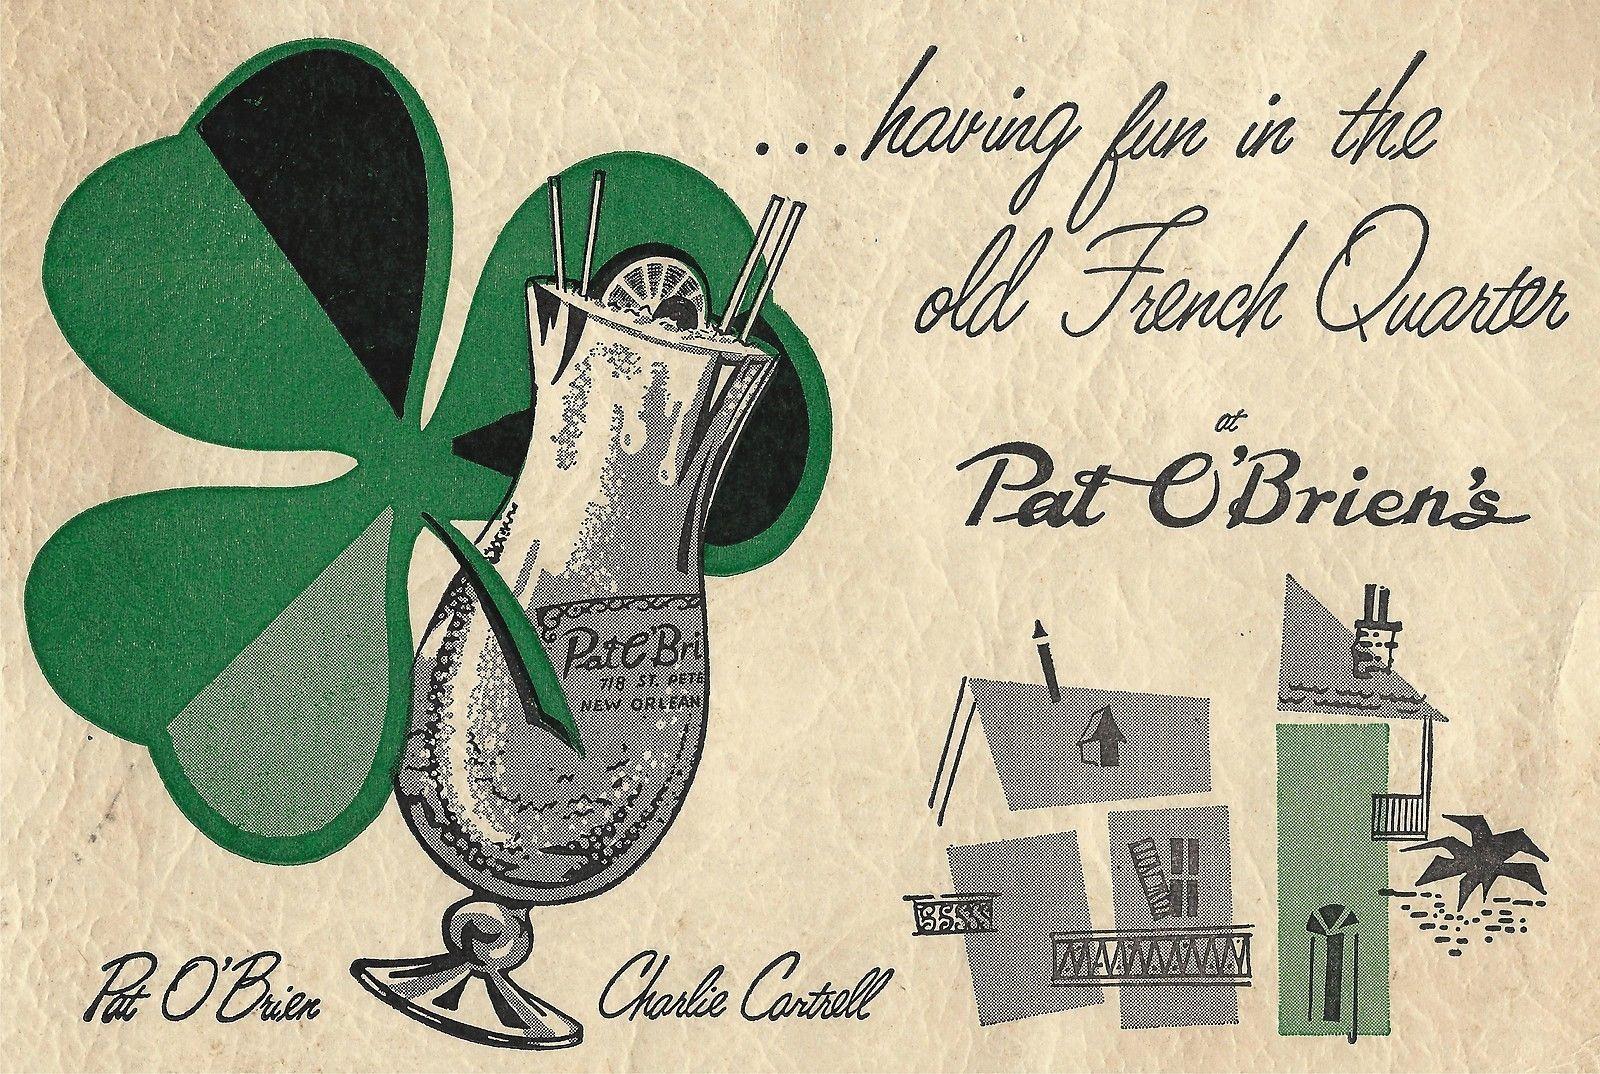 A Very Vintage Mardi Gras